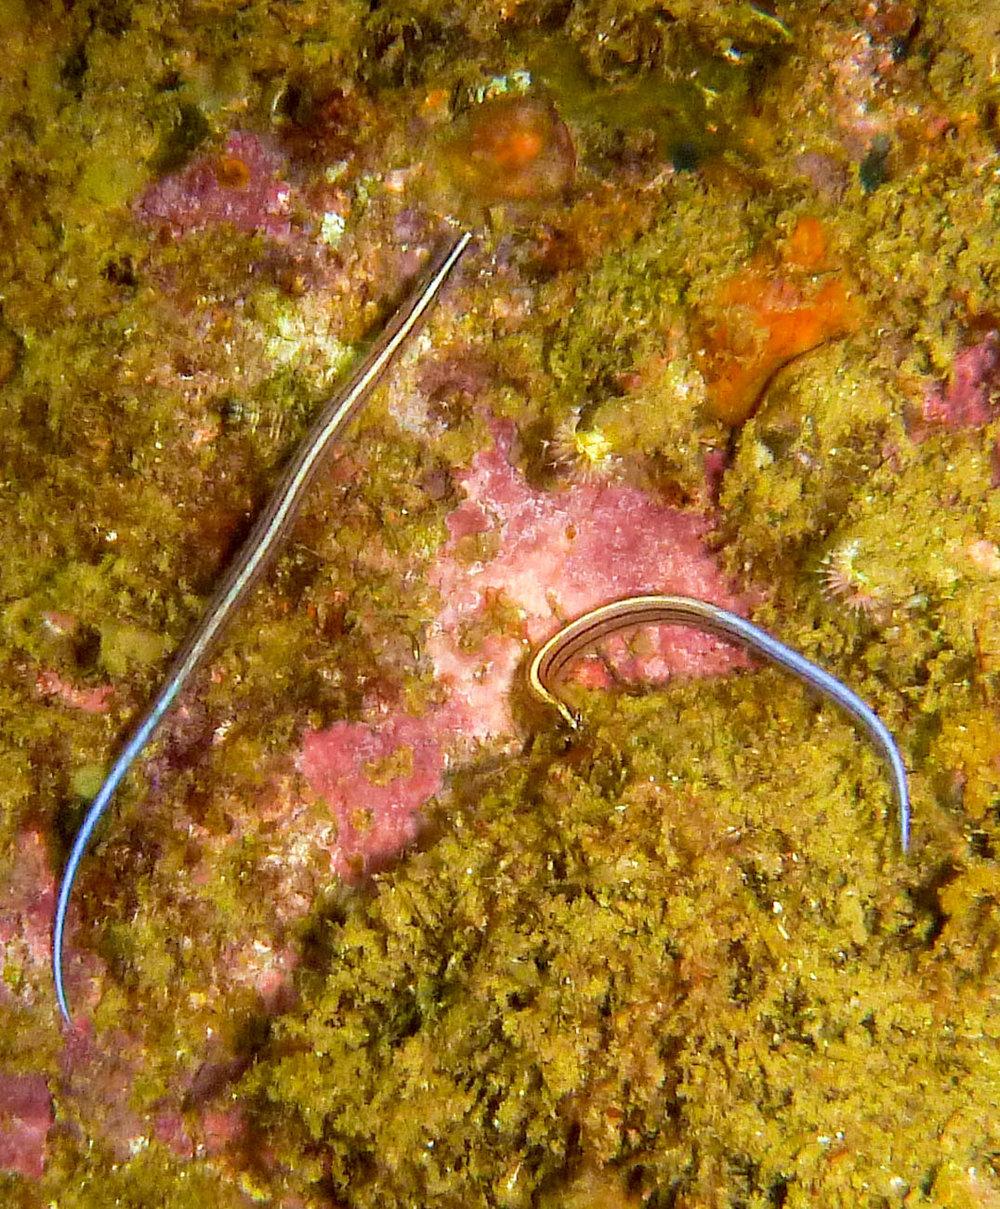 Sawtooth pipefish